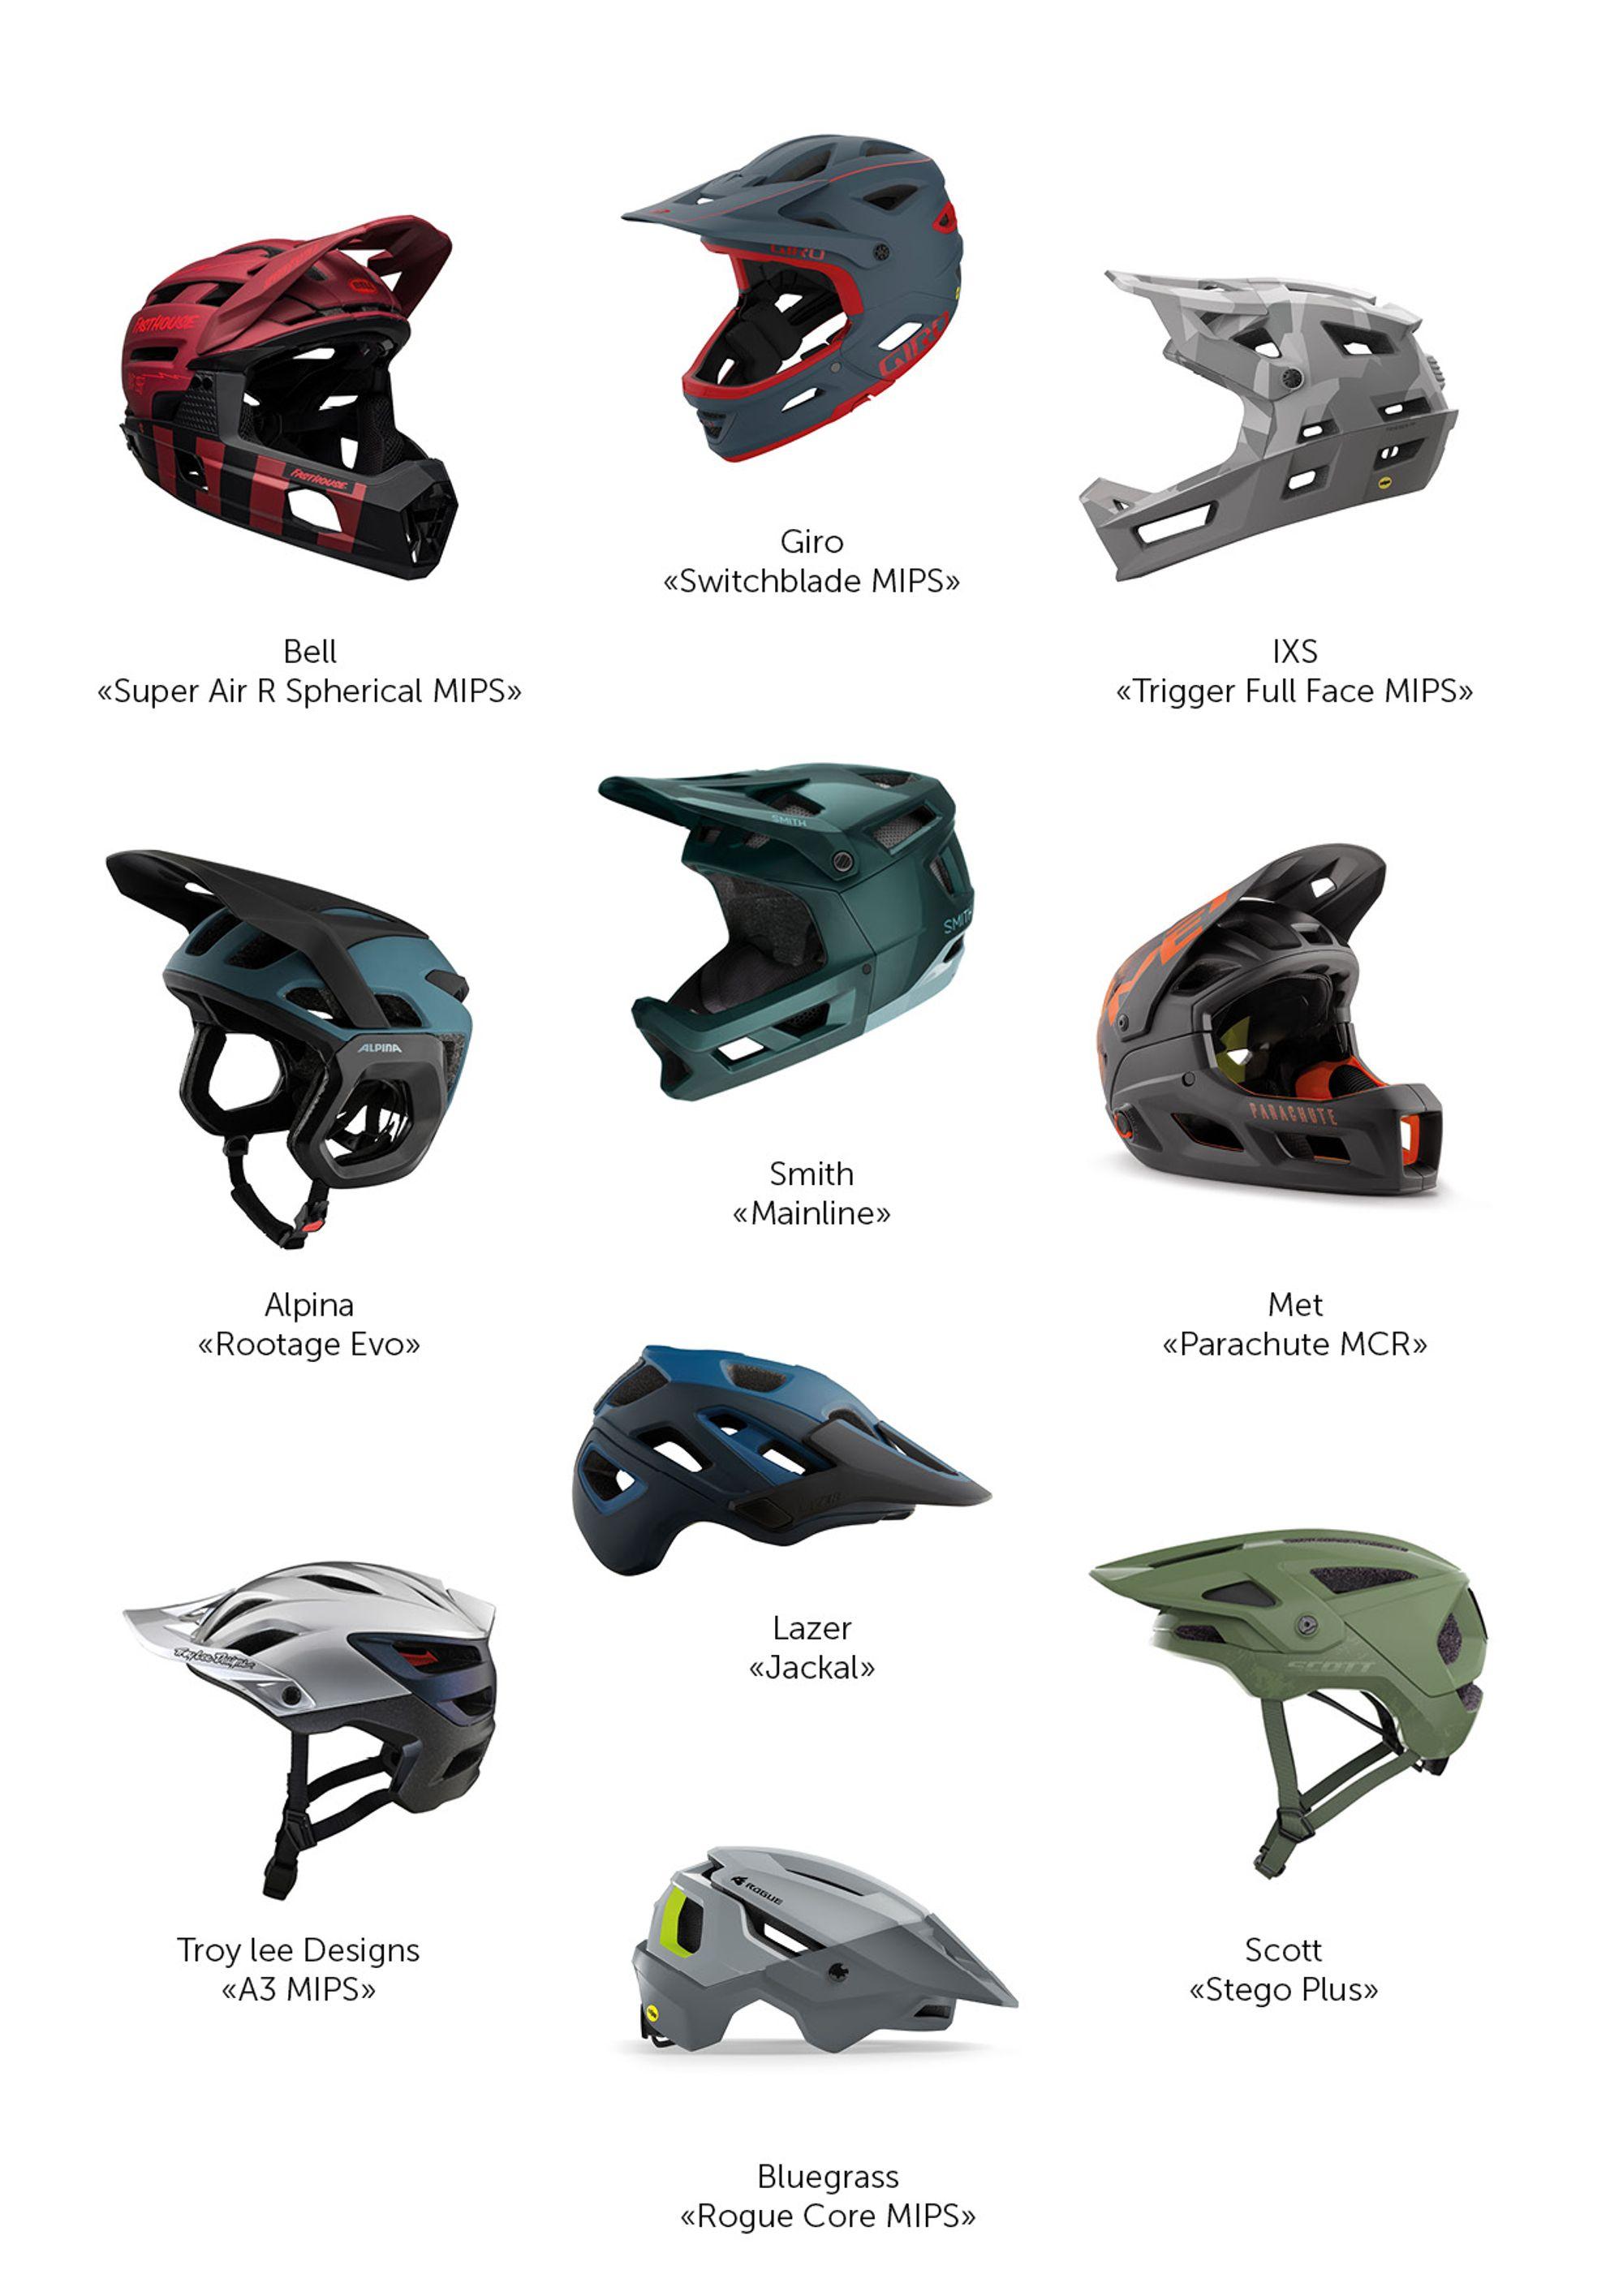 Harte Nuss:   10 Helme für die Trailjagd